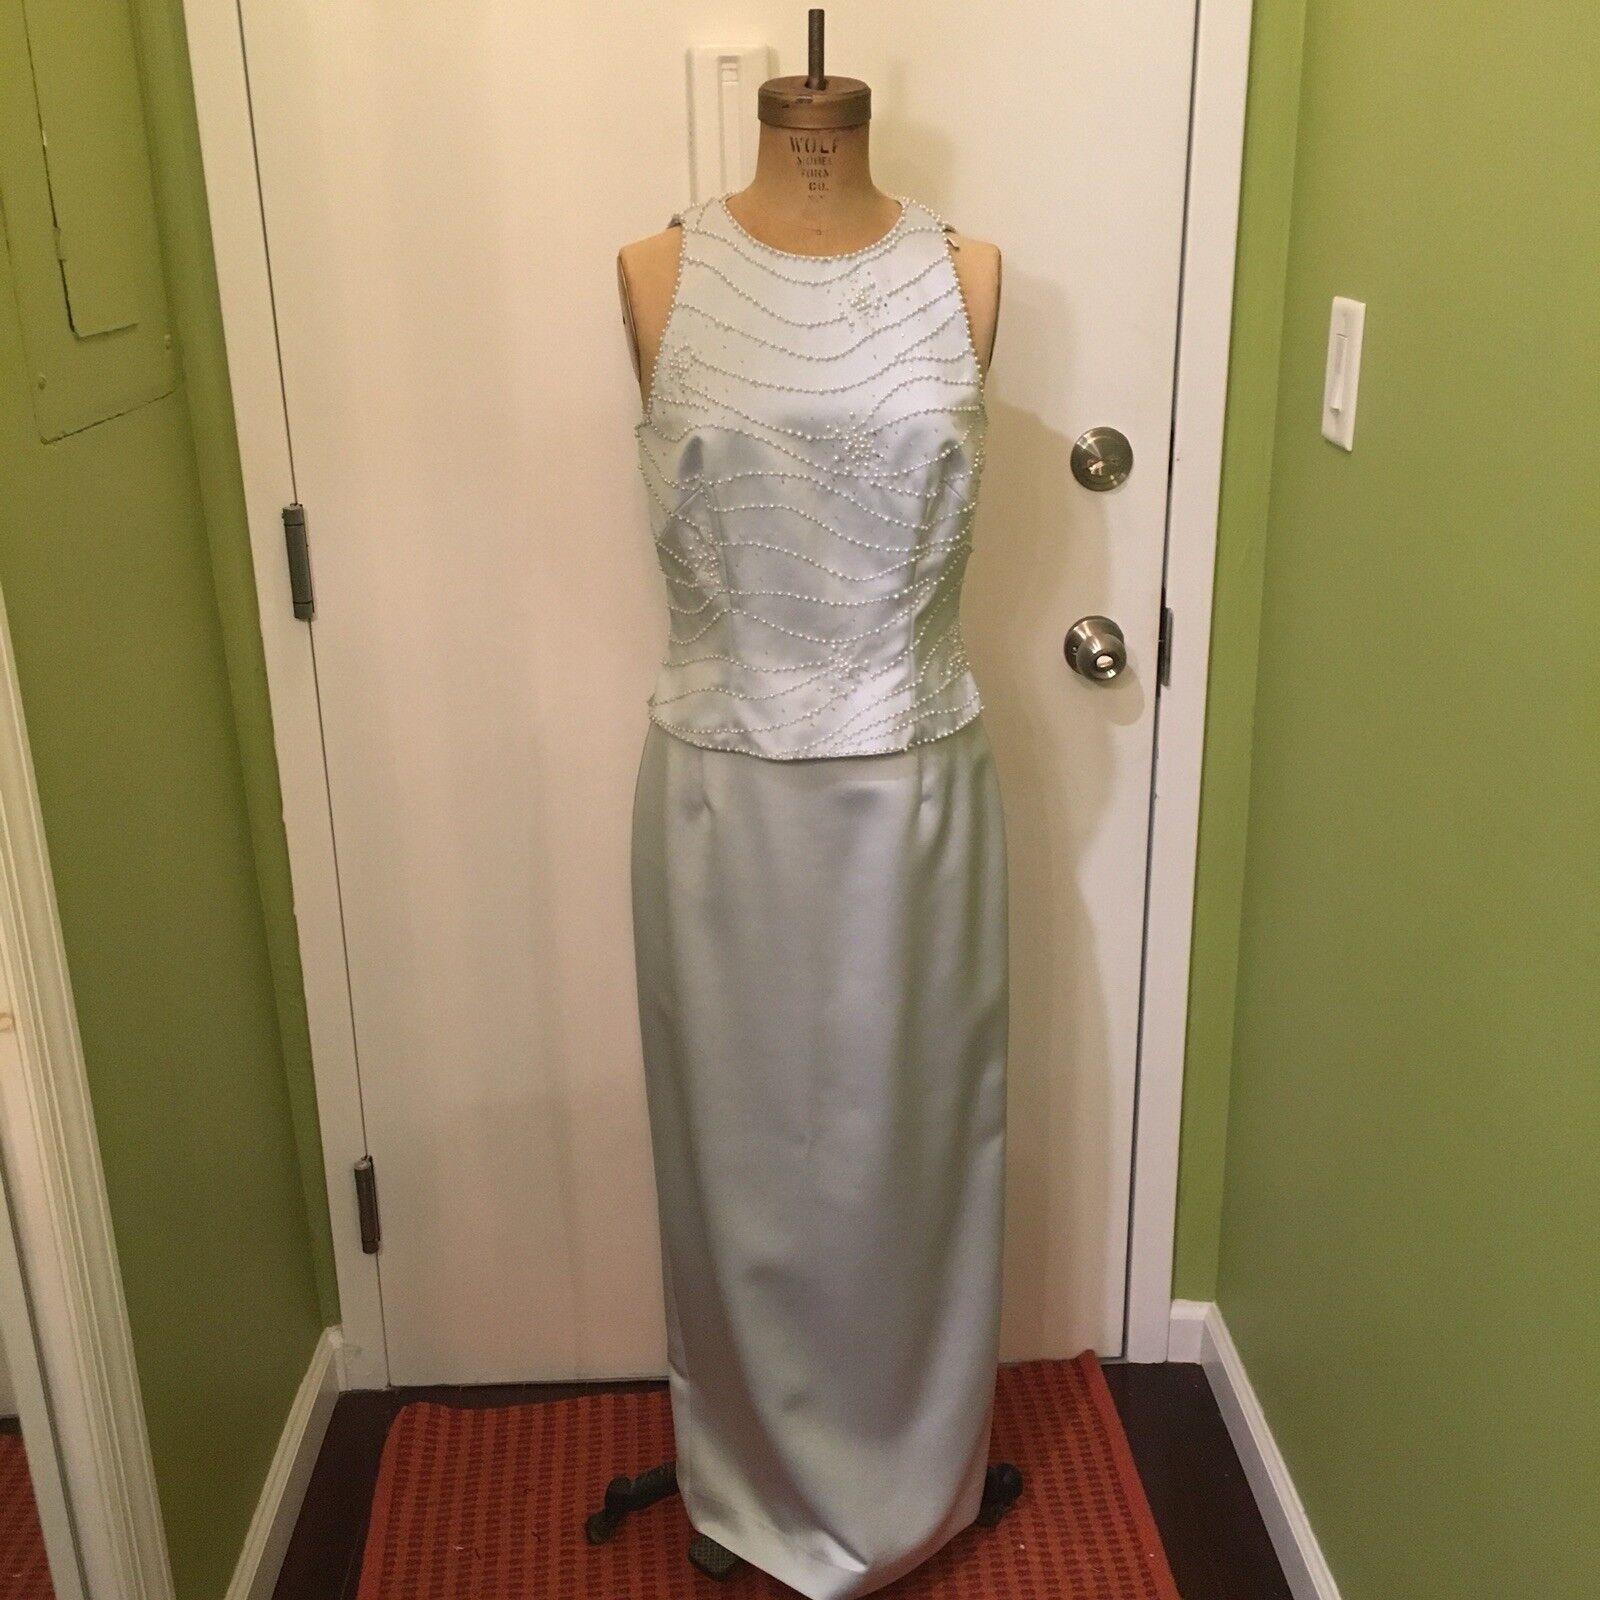 Vintage Zola Evening Formal Wedding Sleeveless Top Skirt Set Dress Gown Size 8